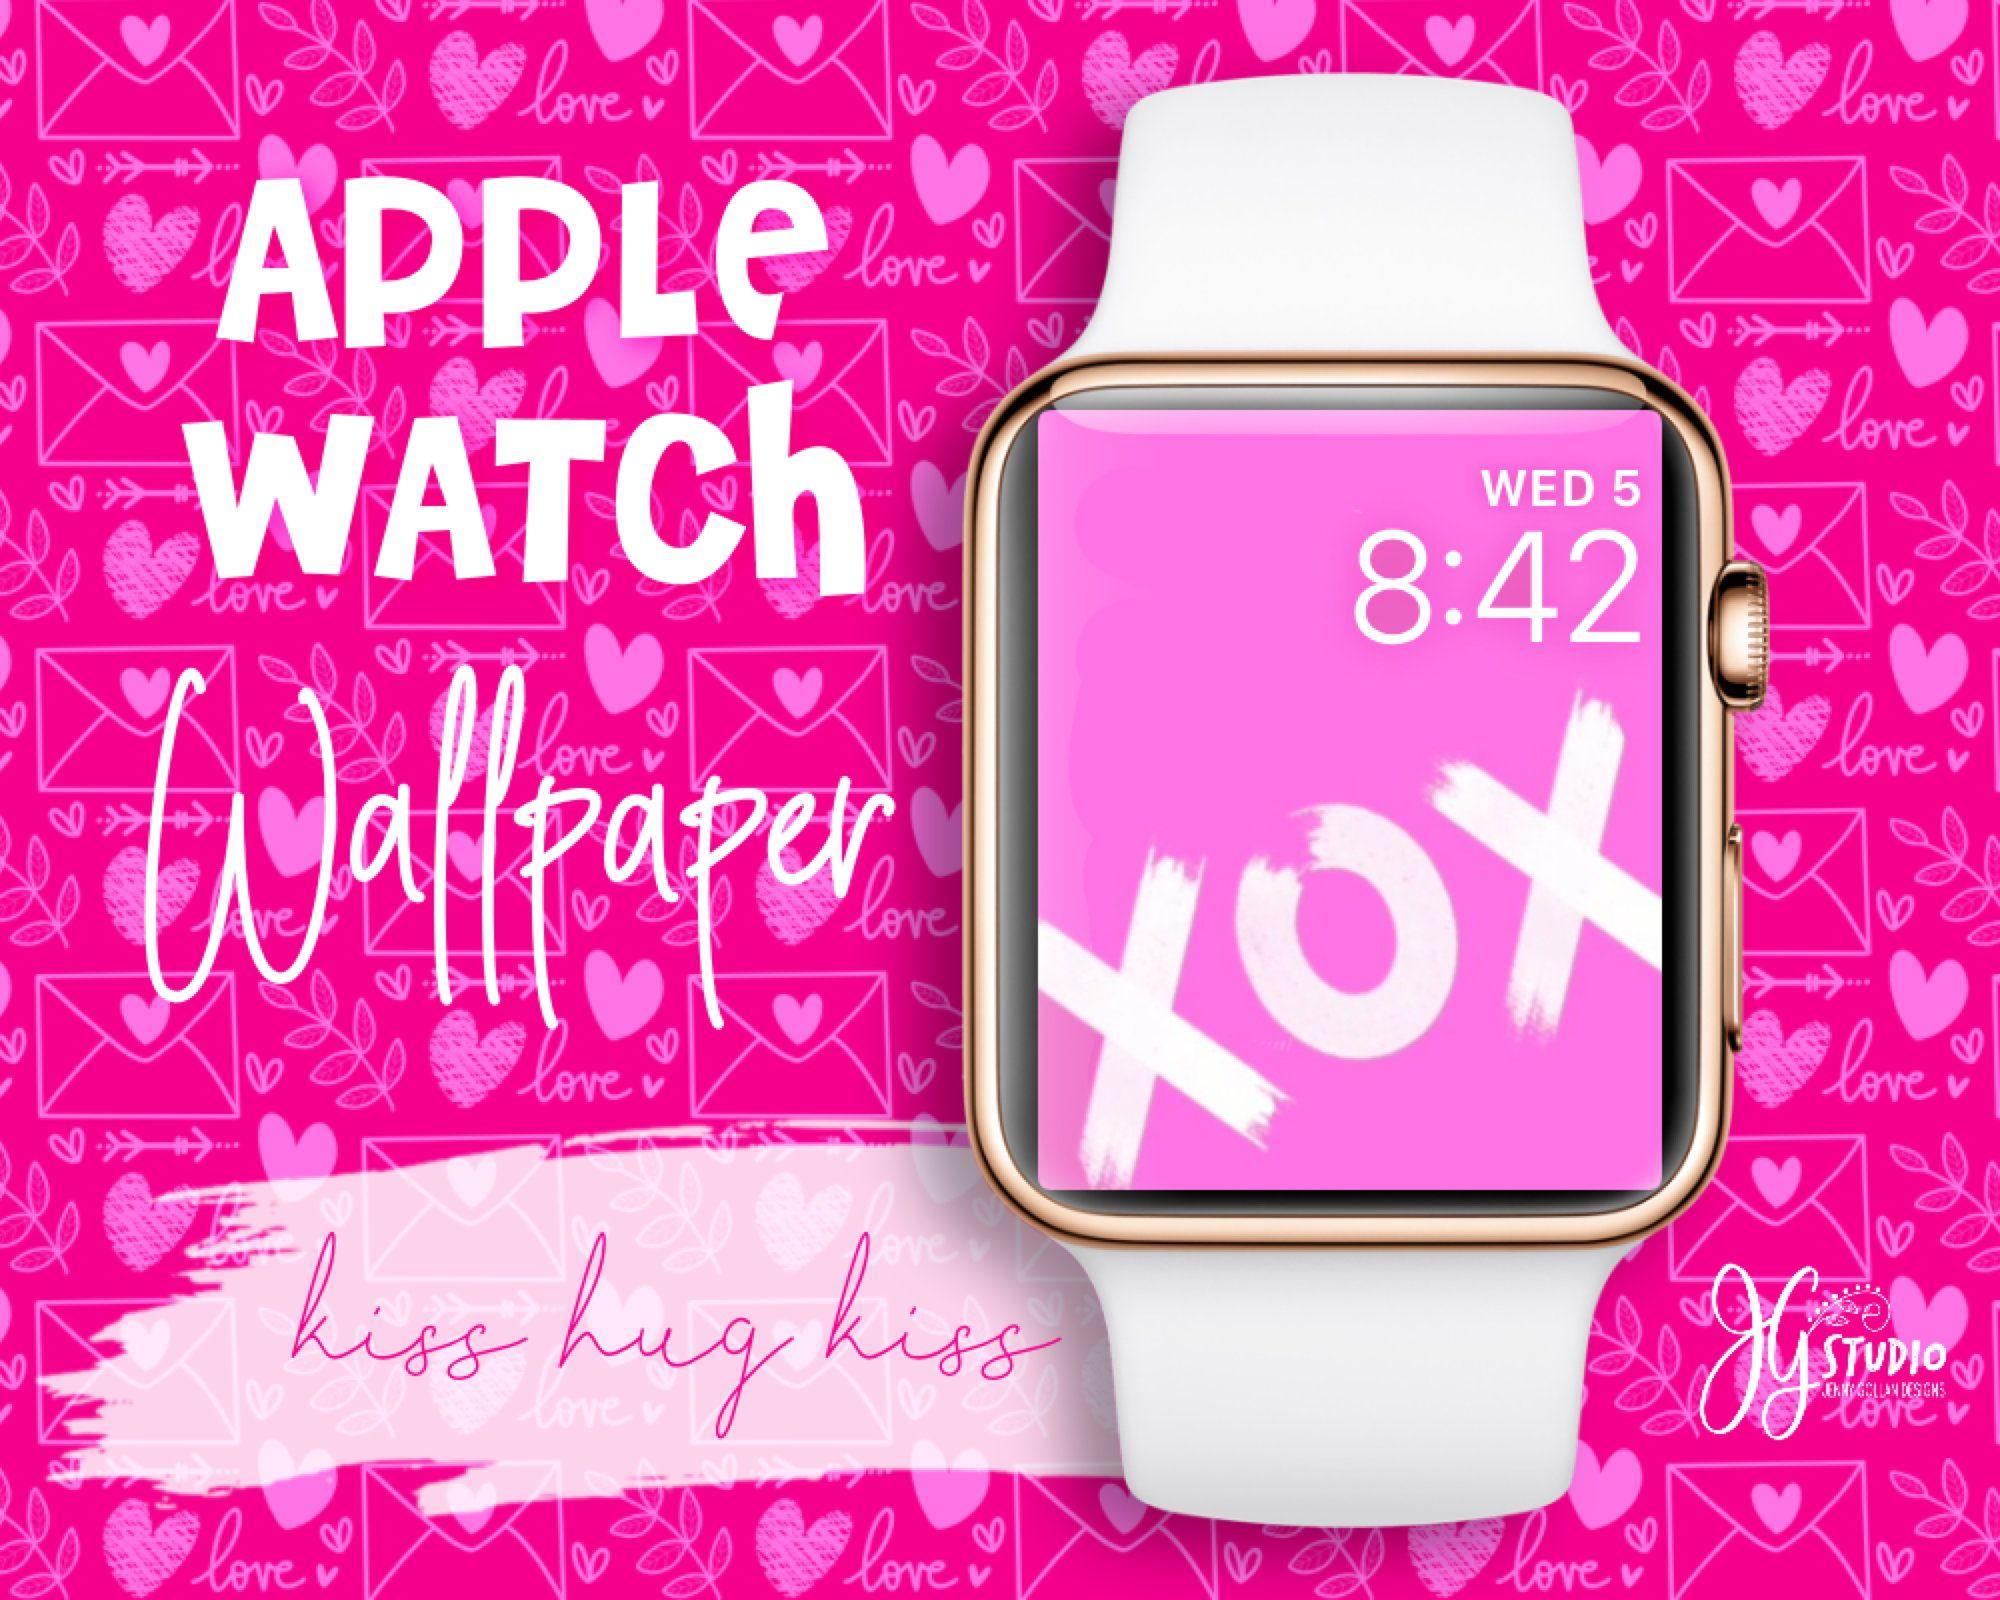 Apple Watch Wallpaper Kiss Hug Kiss Valentine Apple Watch Face 2000x1600